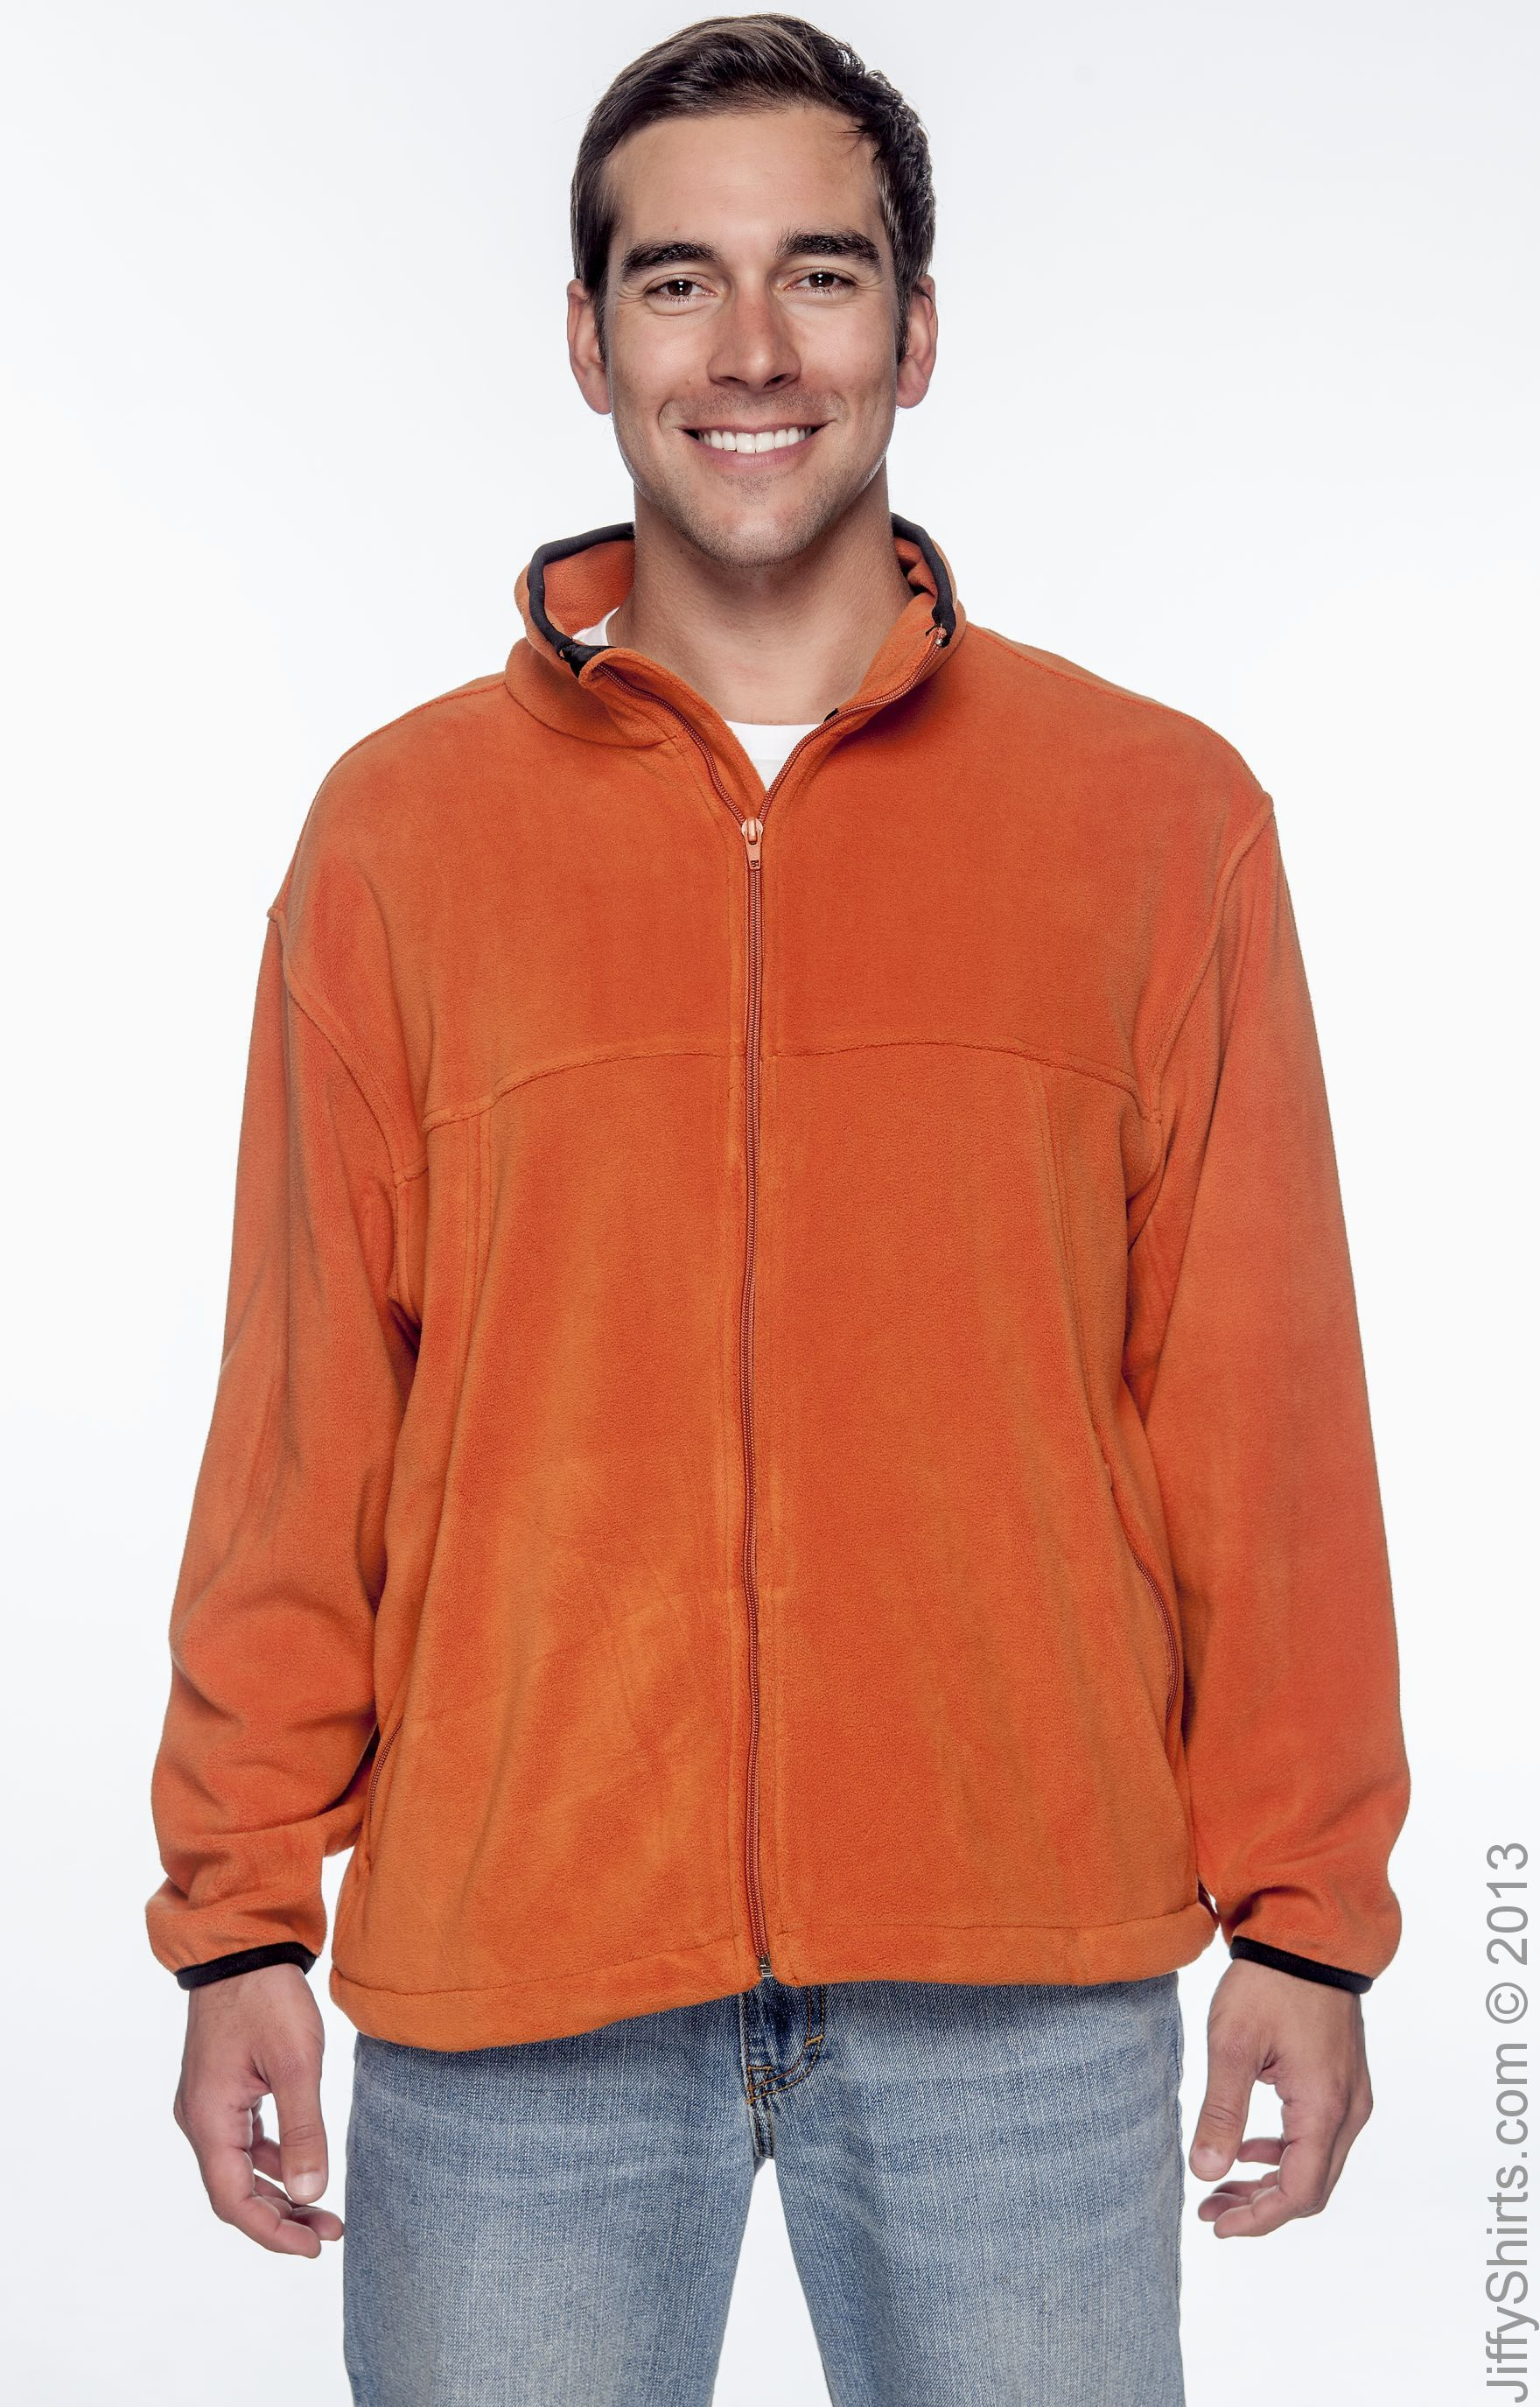 Chestnut Hill Microfleece Full-Zip Jacket Sienna S CH900